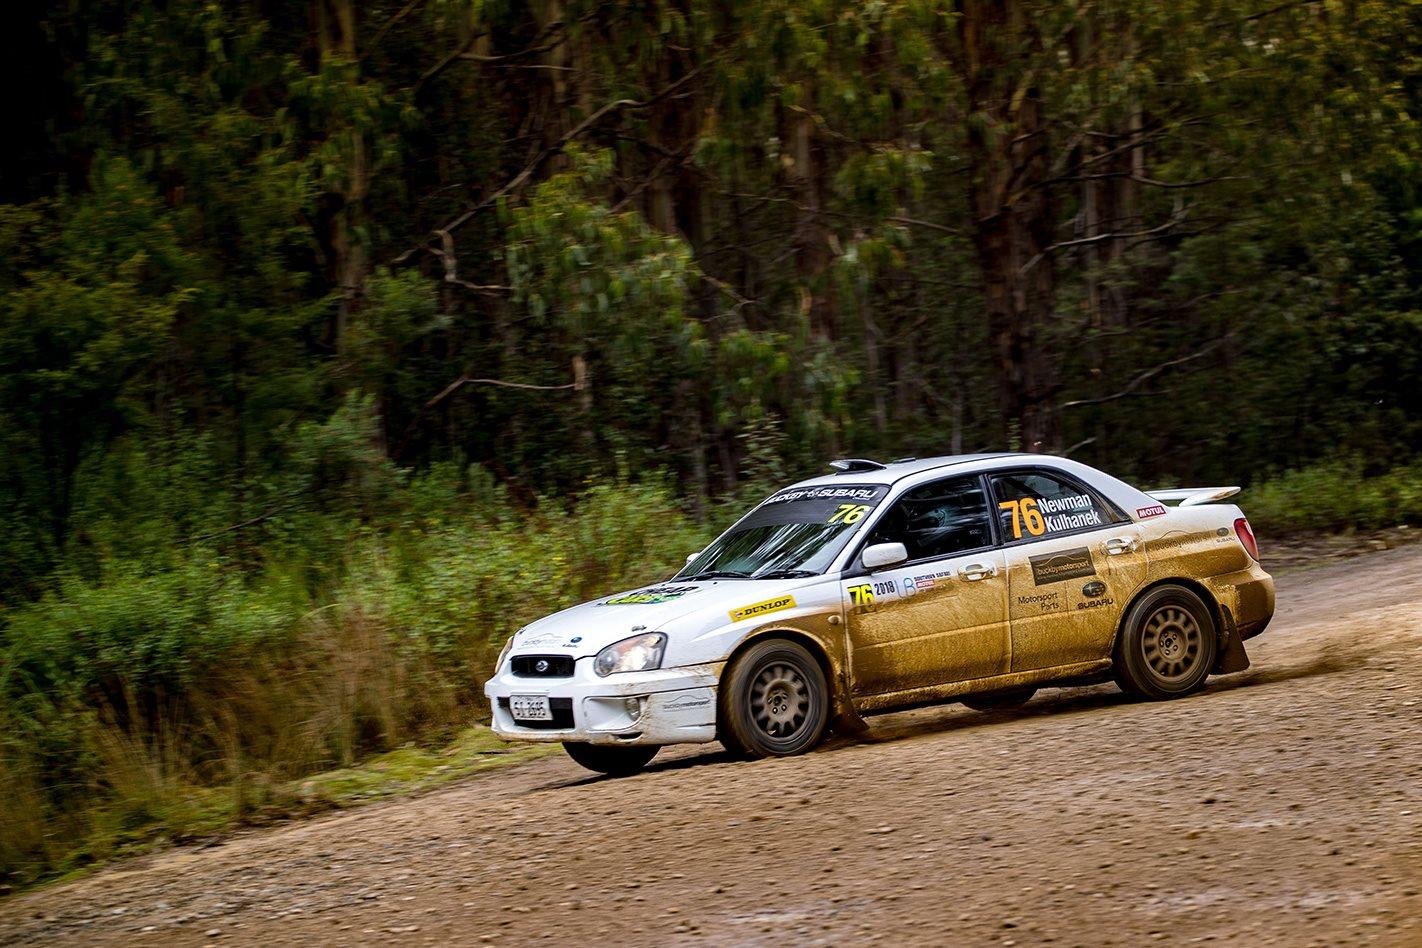 Subaru Impreza RS drift